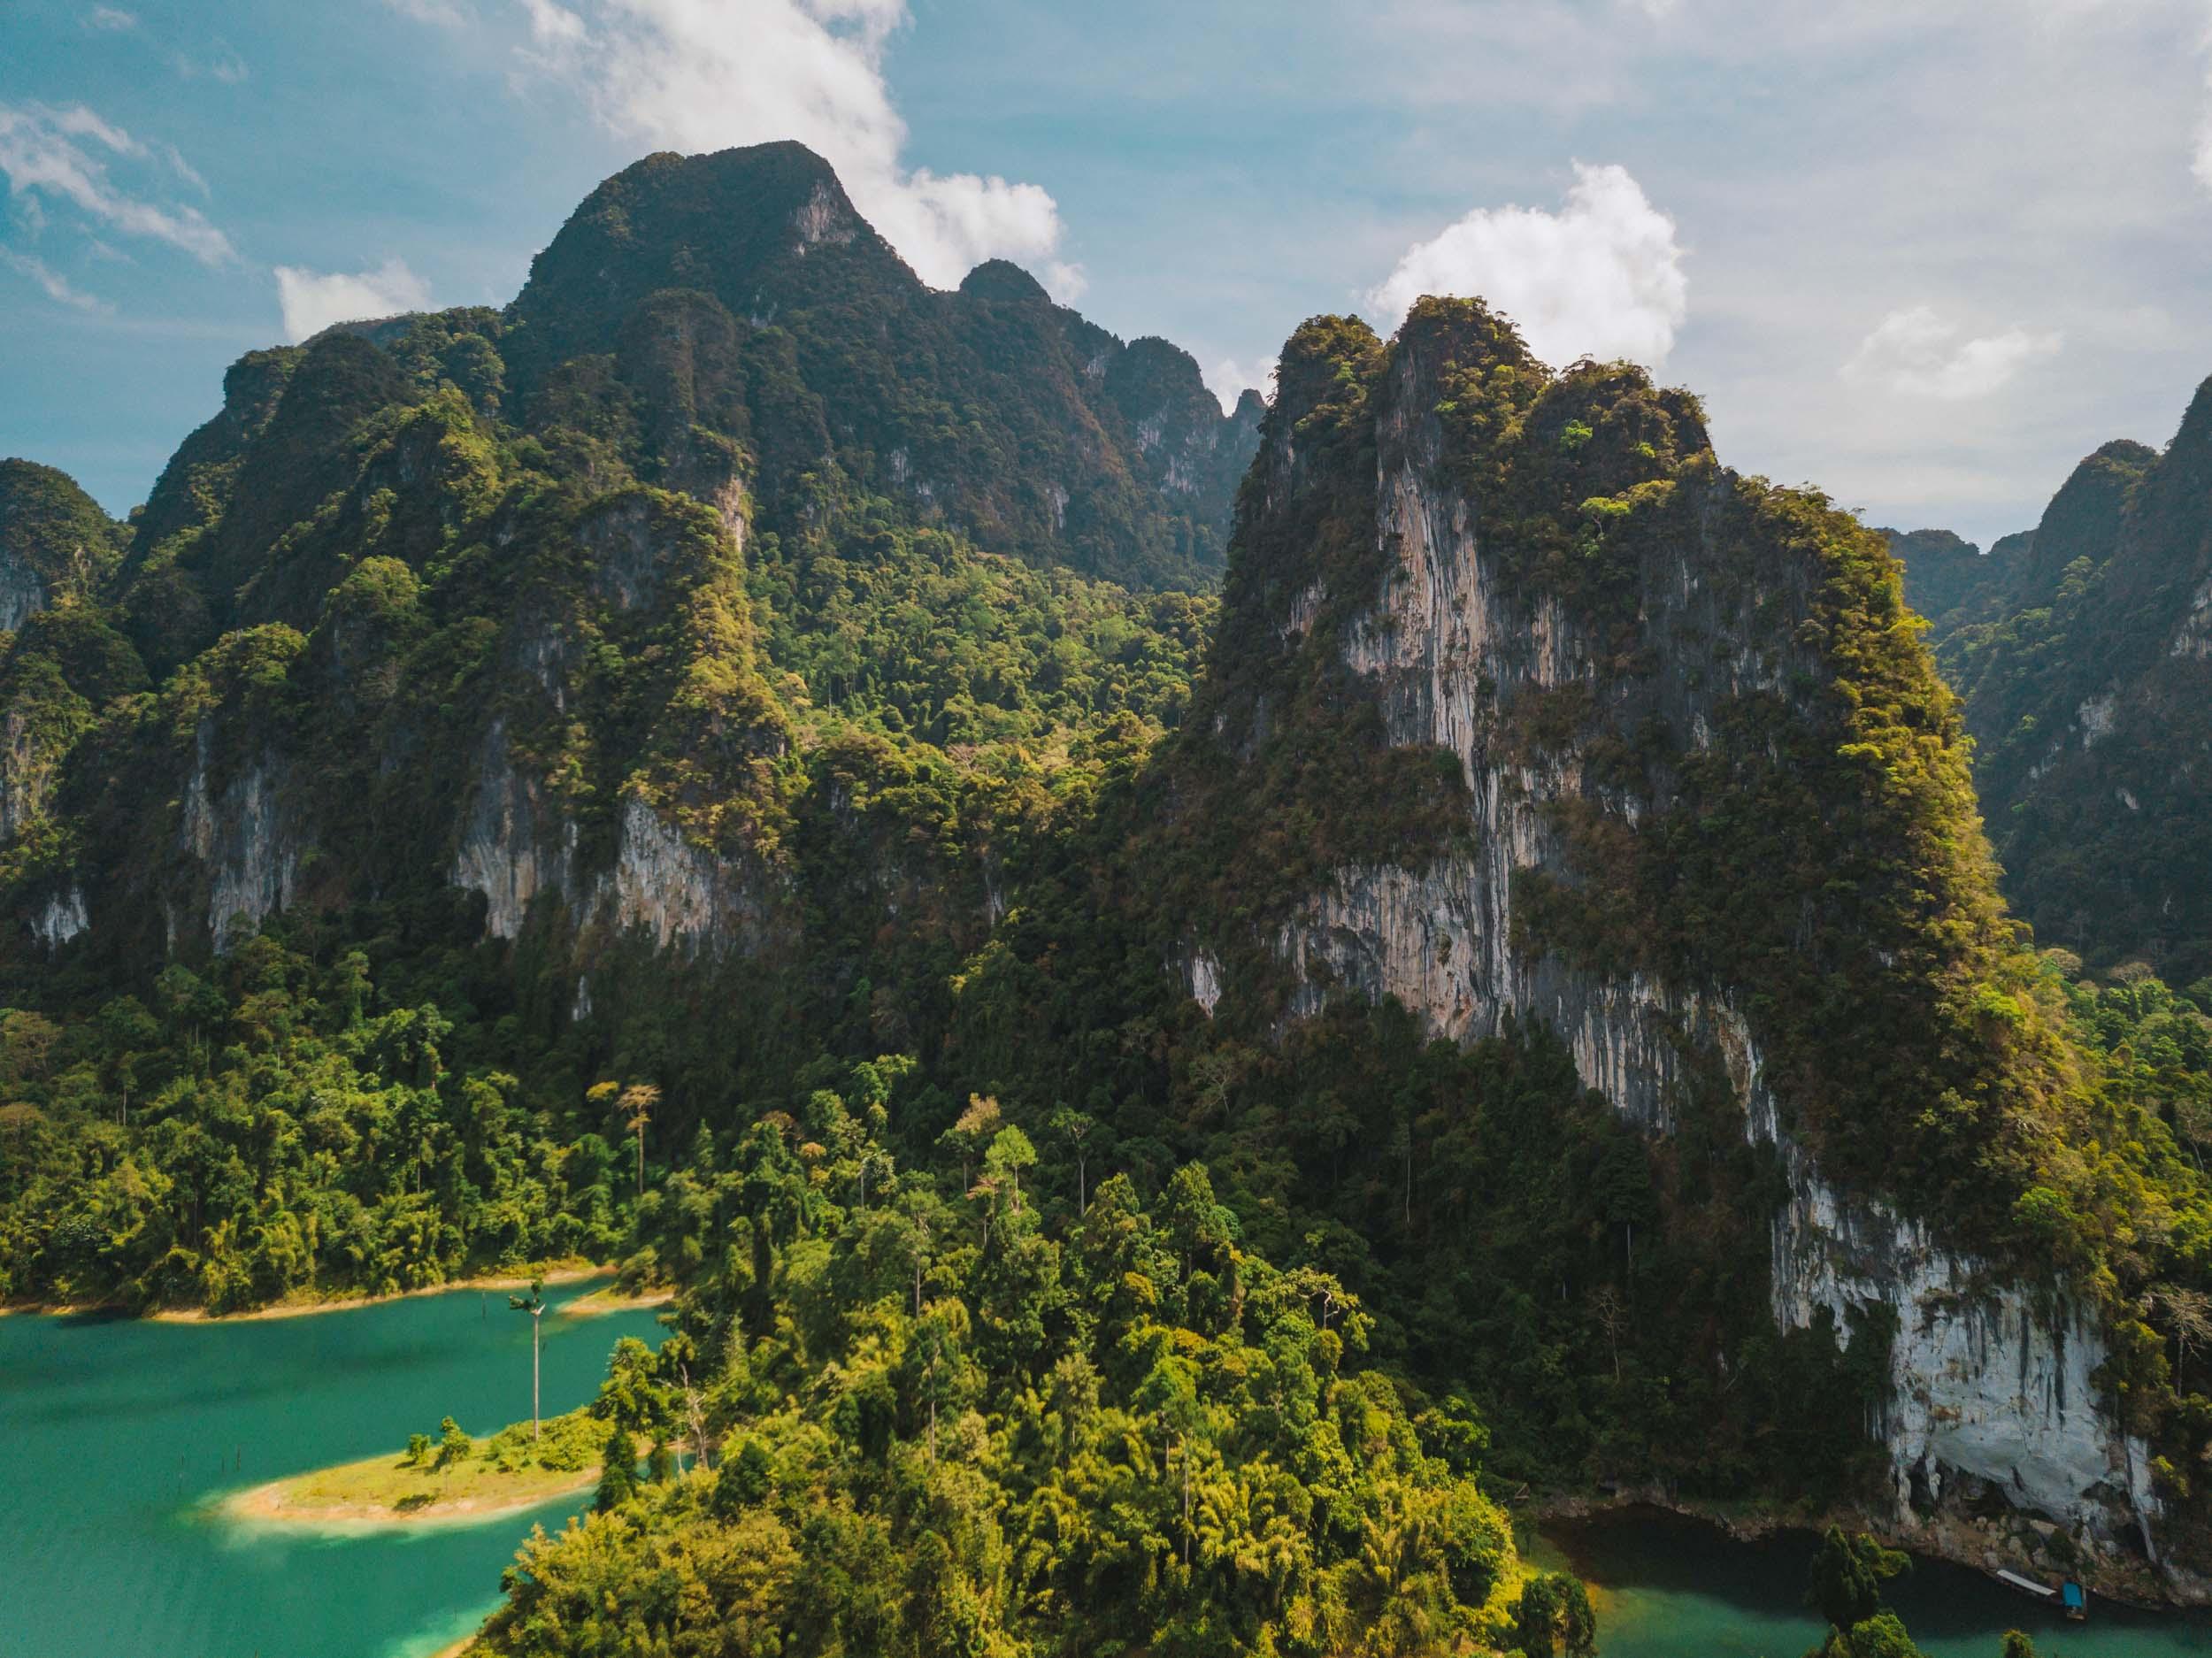 Thailand-20180306-000810.jpg